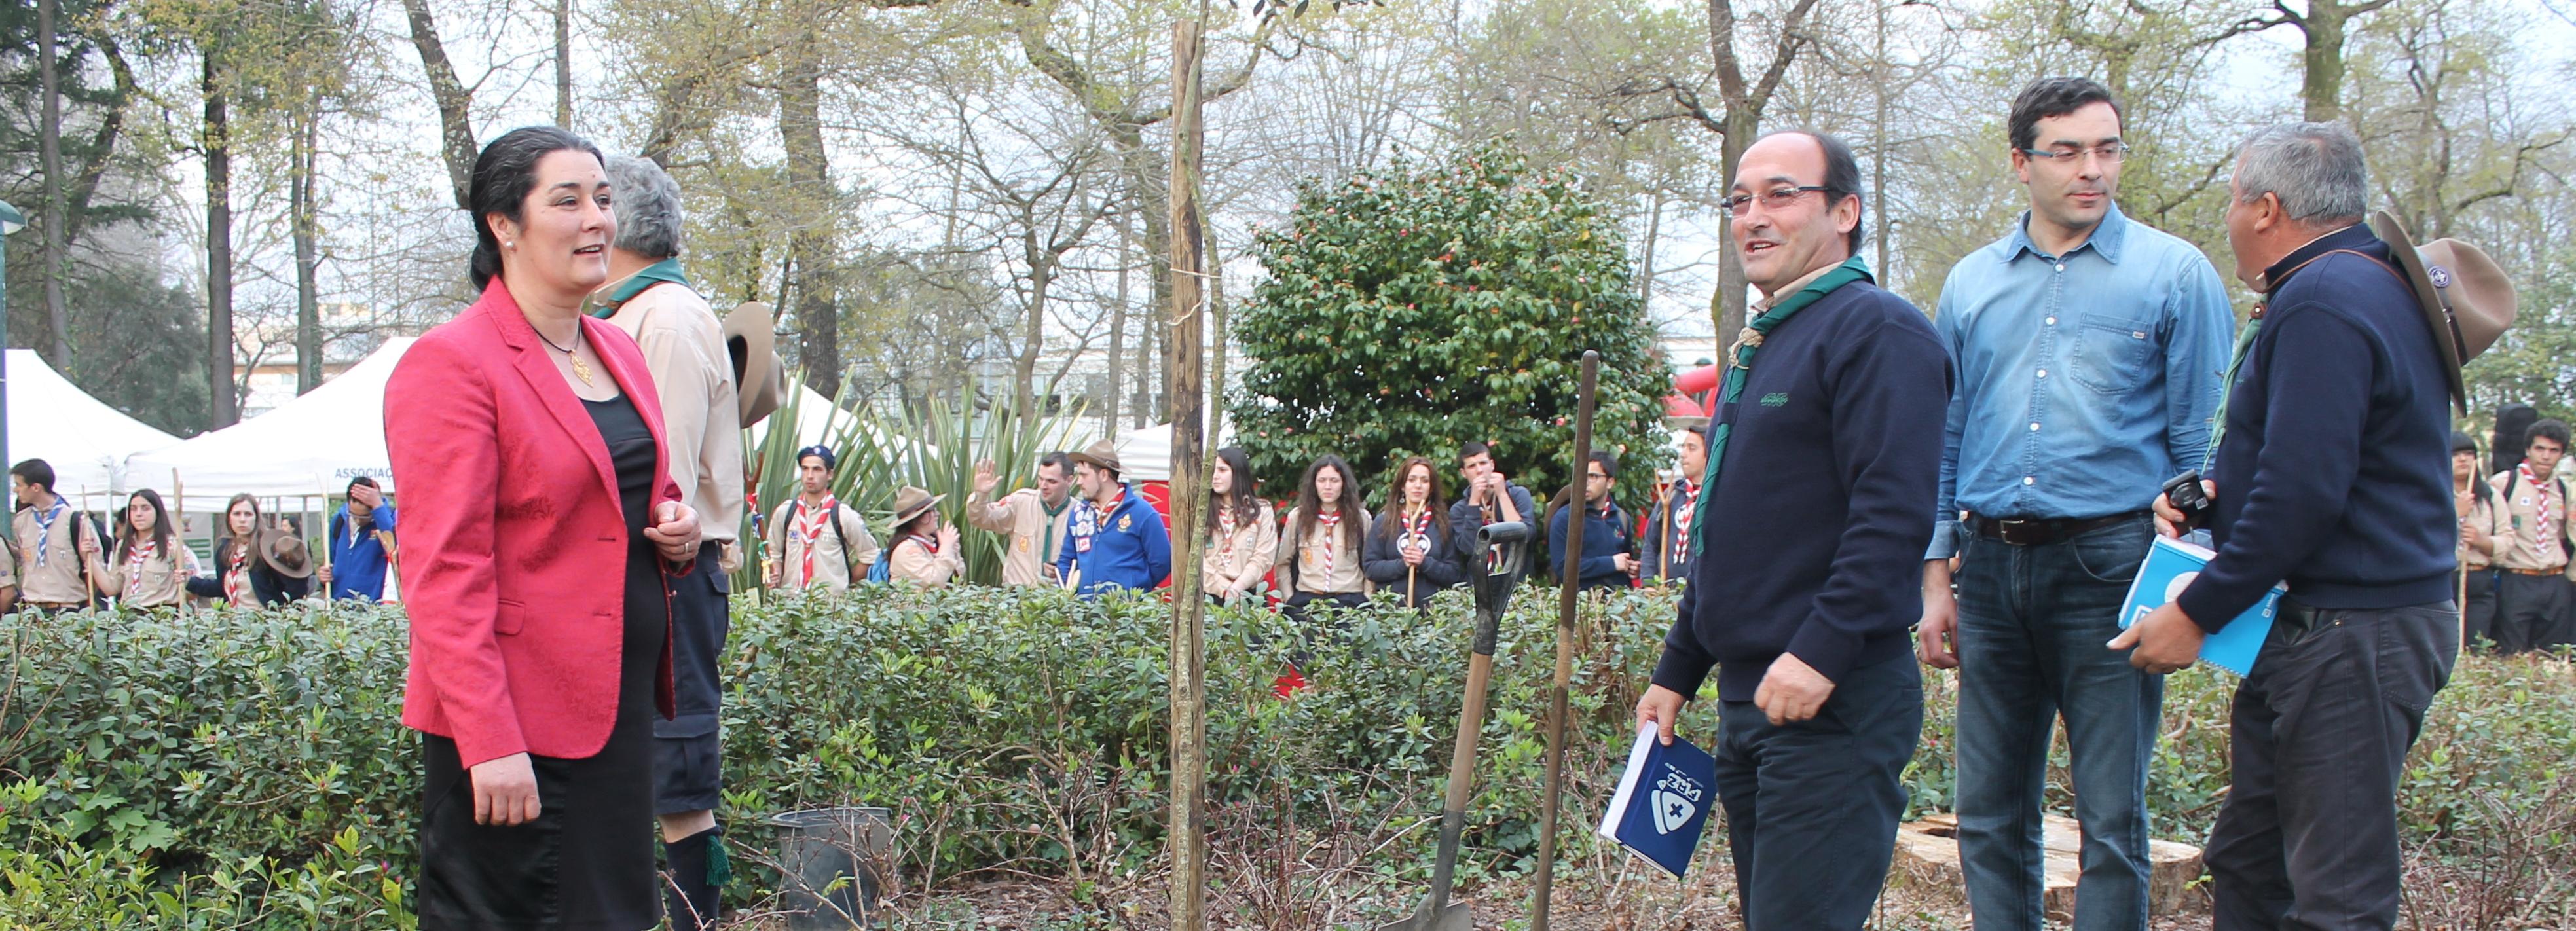 Município de Barcelos comemorou Dia Internacional das Florestas